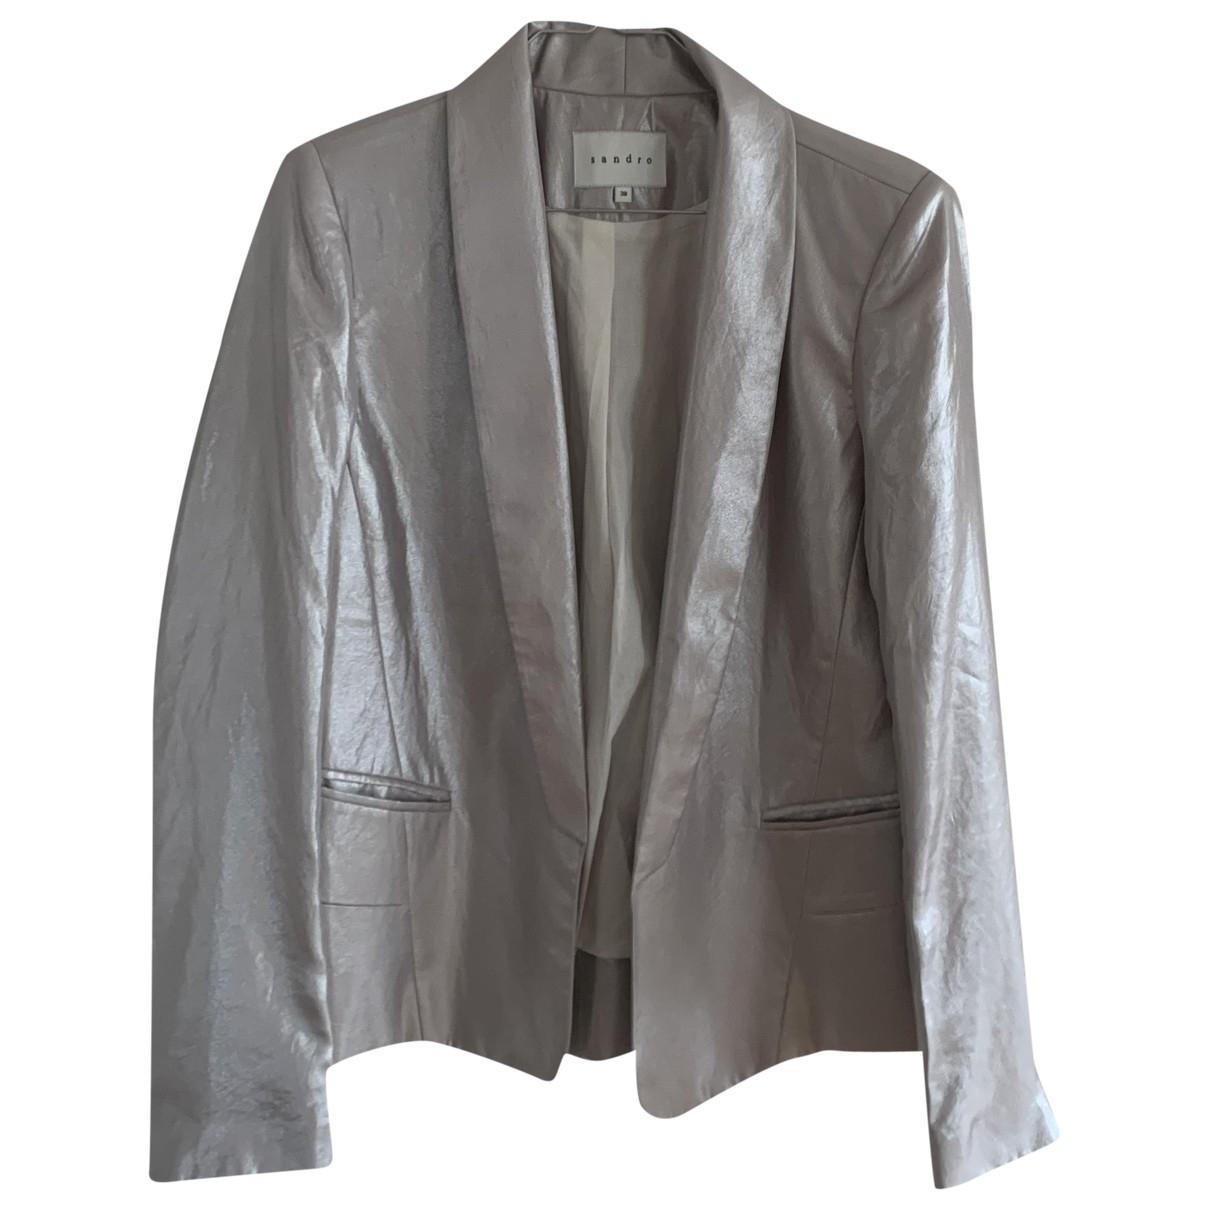 Sandro \N Silver jacket for Women 38 FR